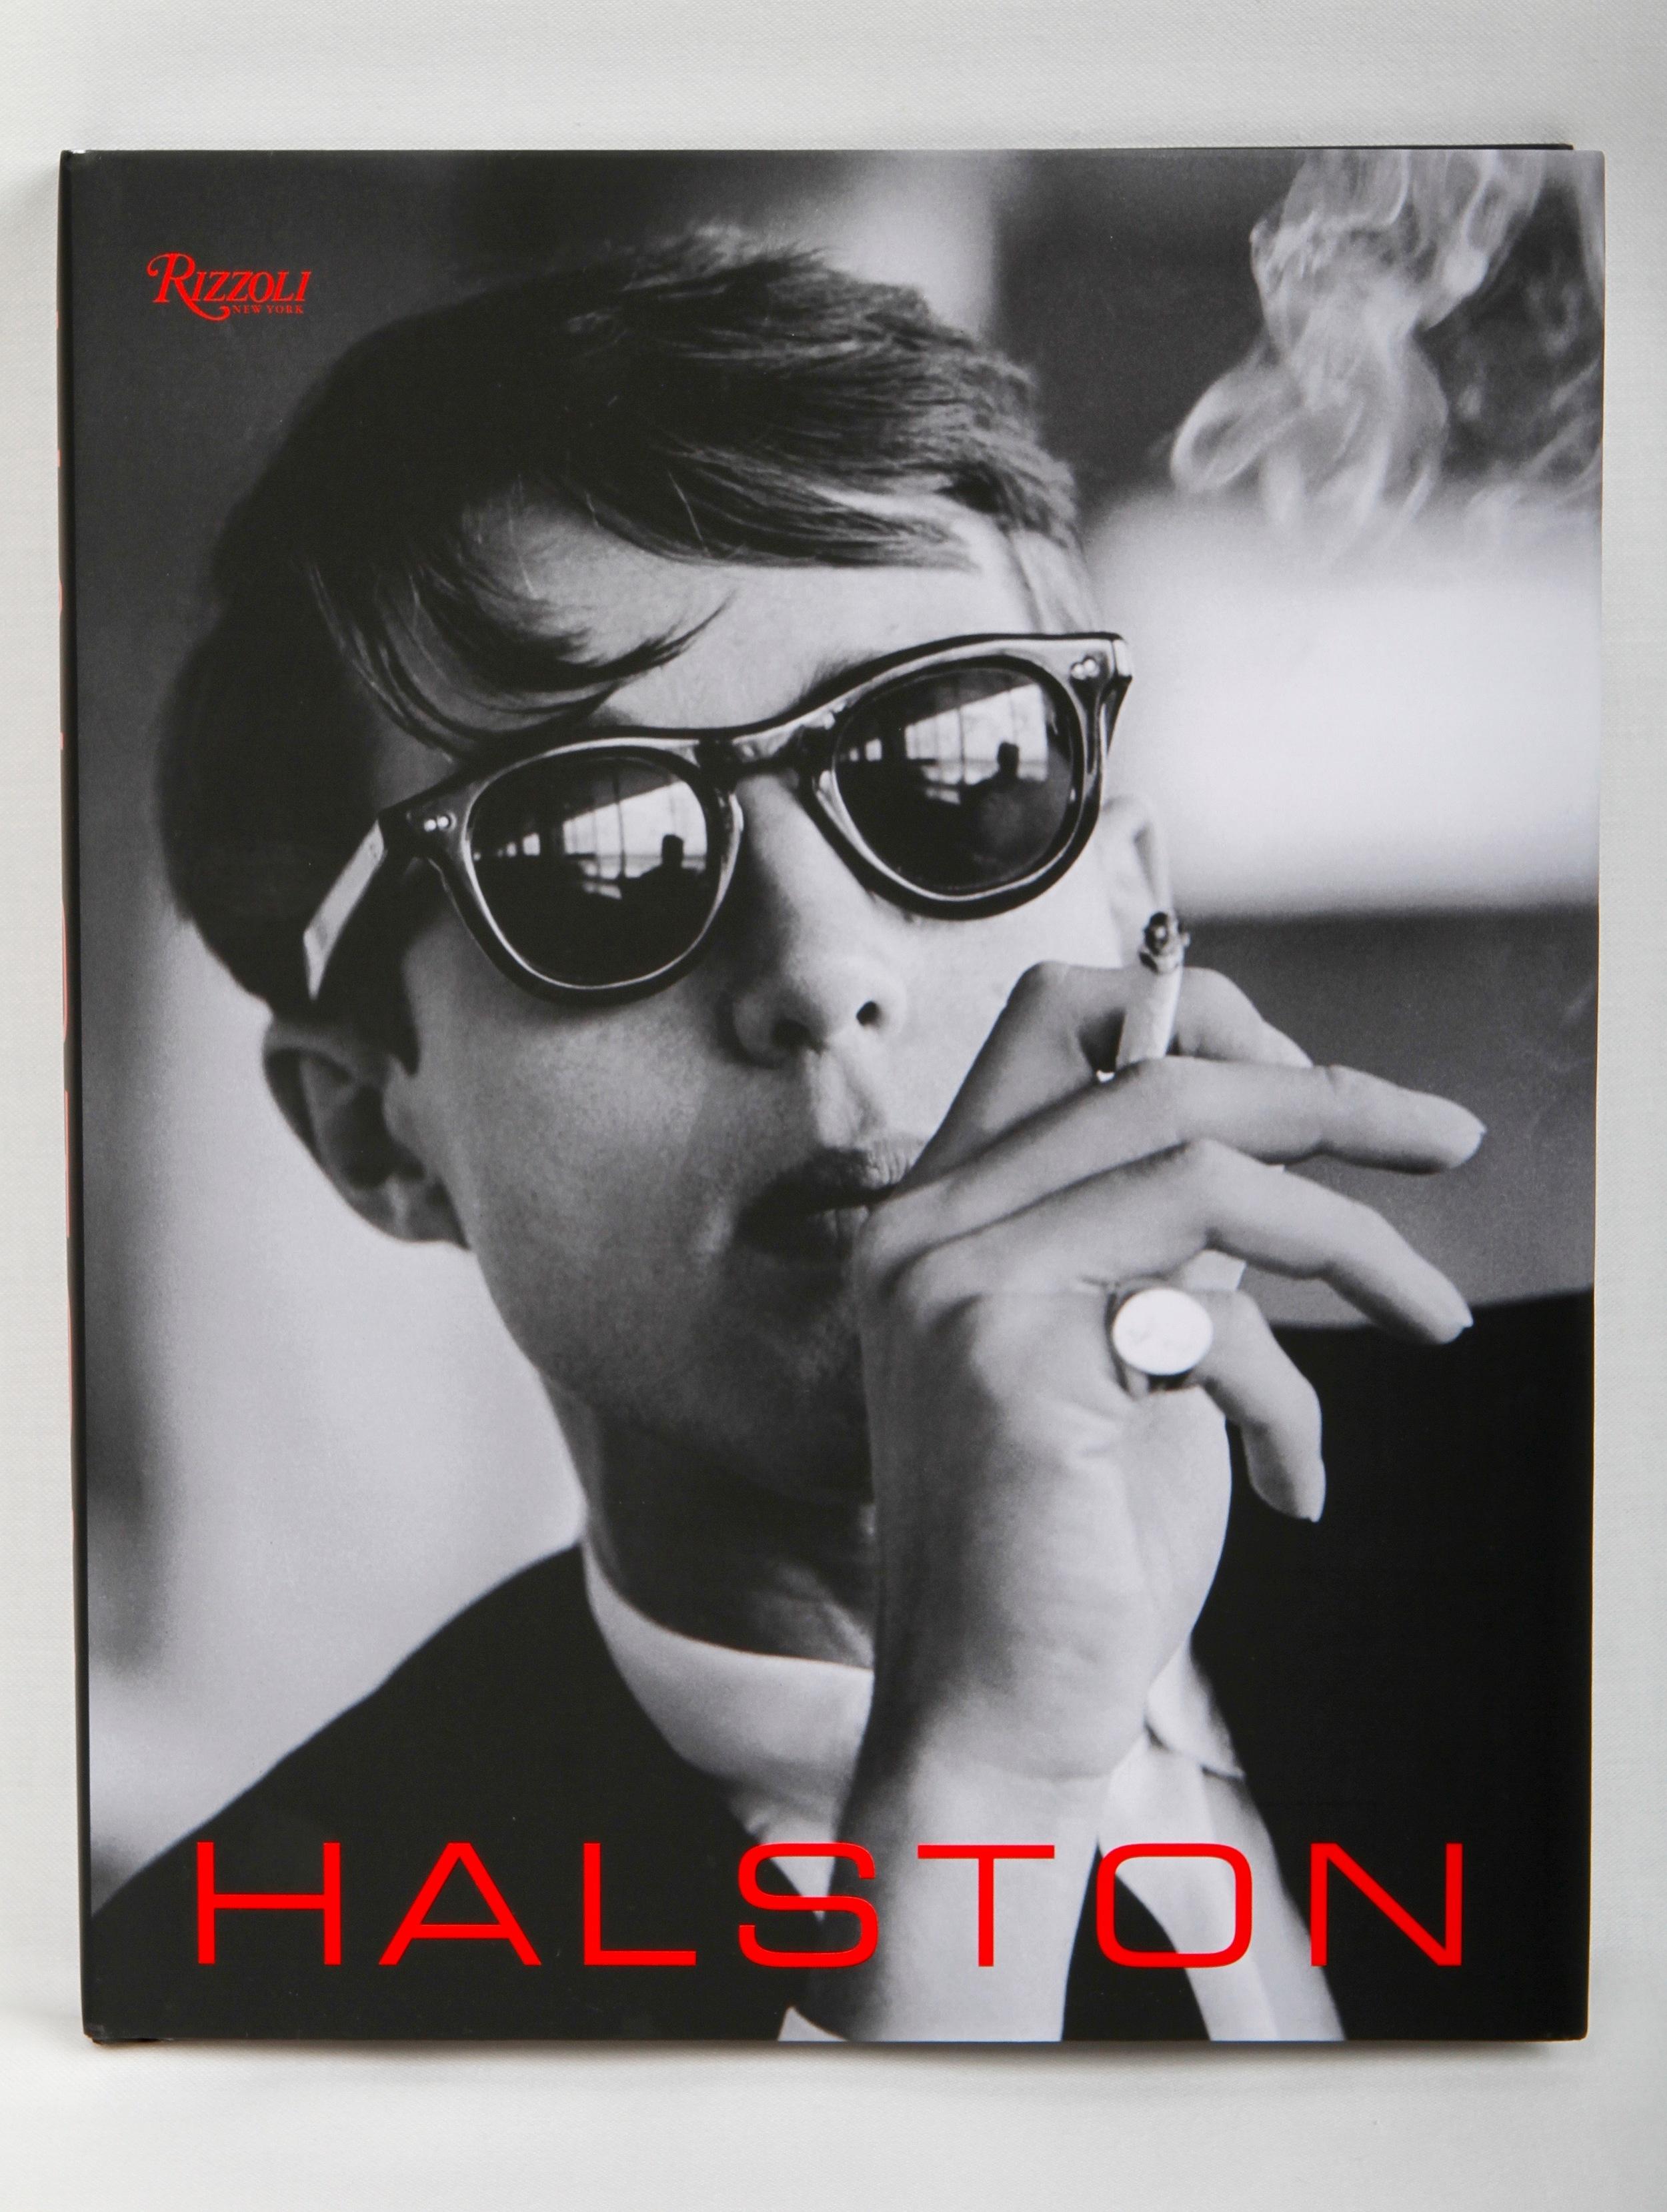 Halston: Inventing American Fashion